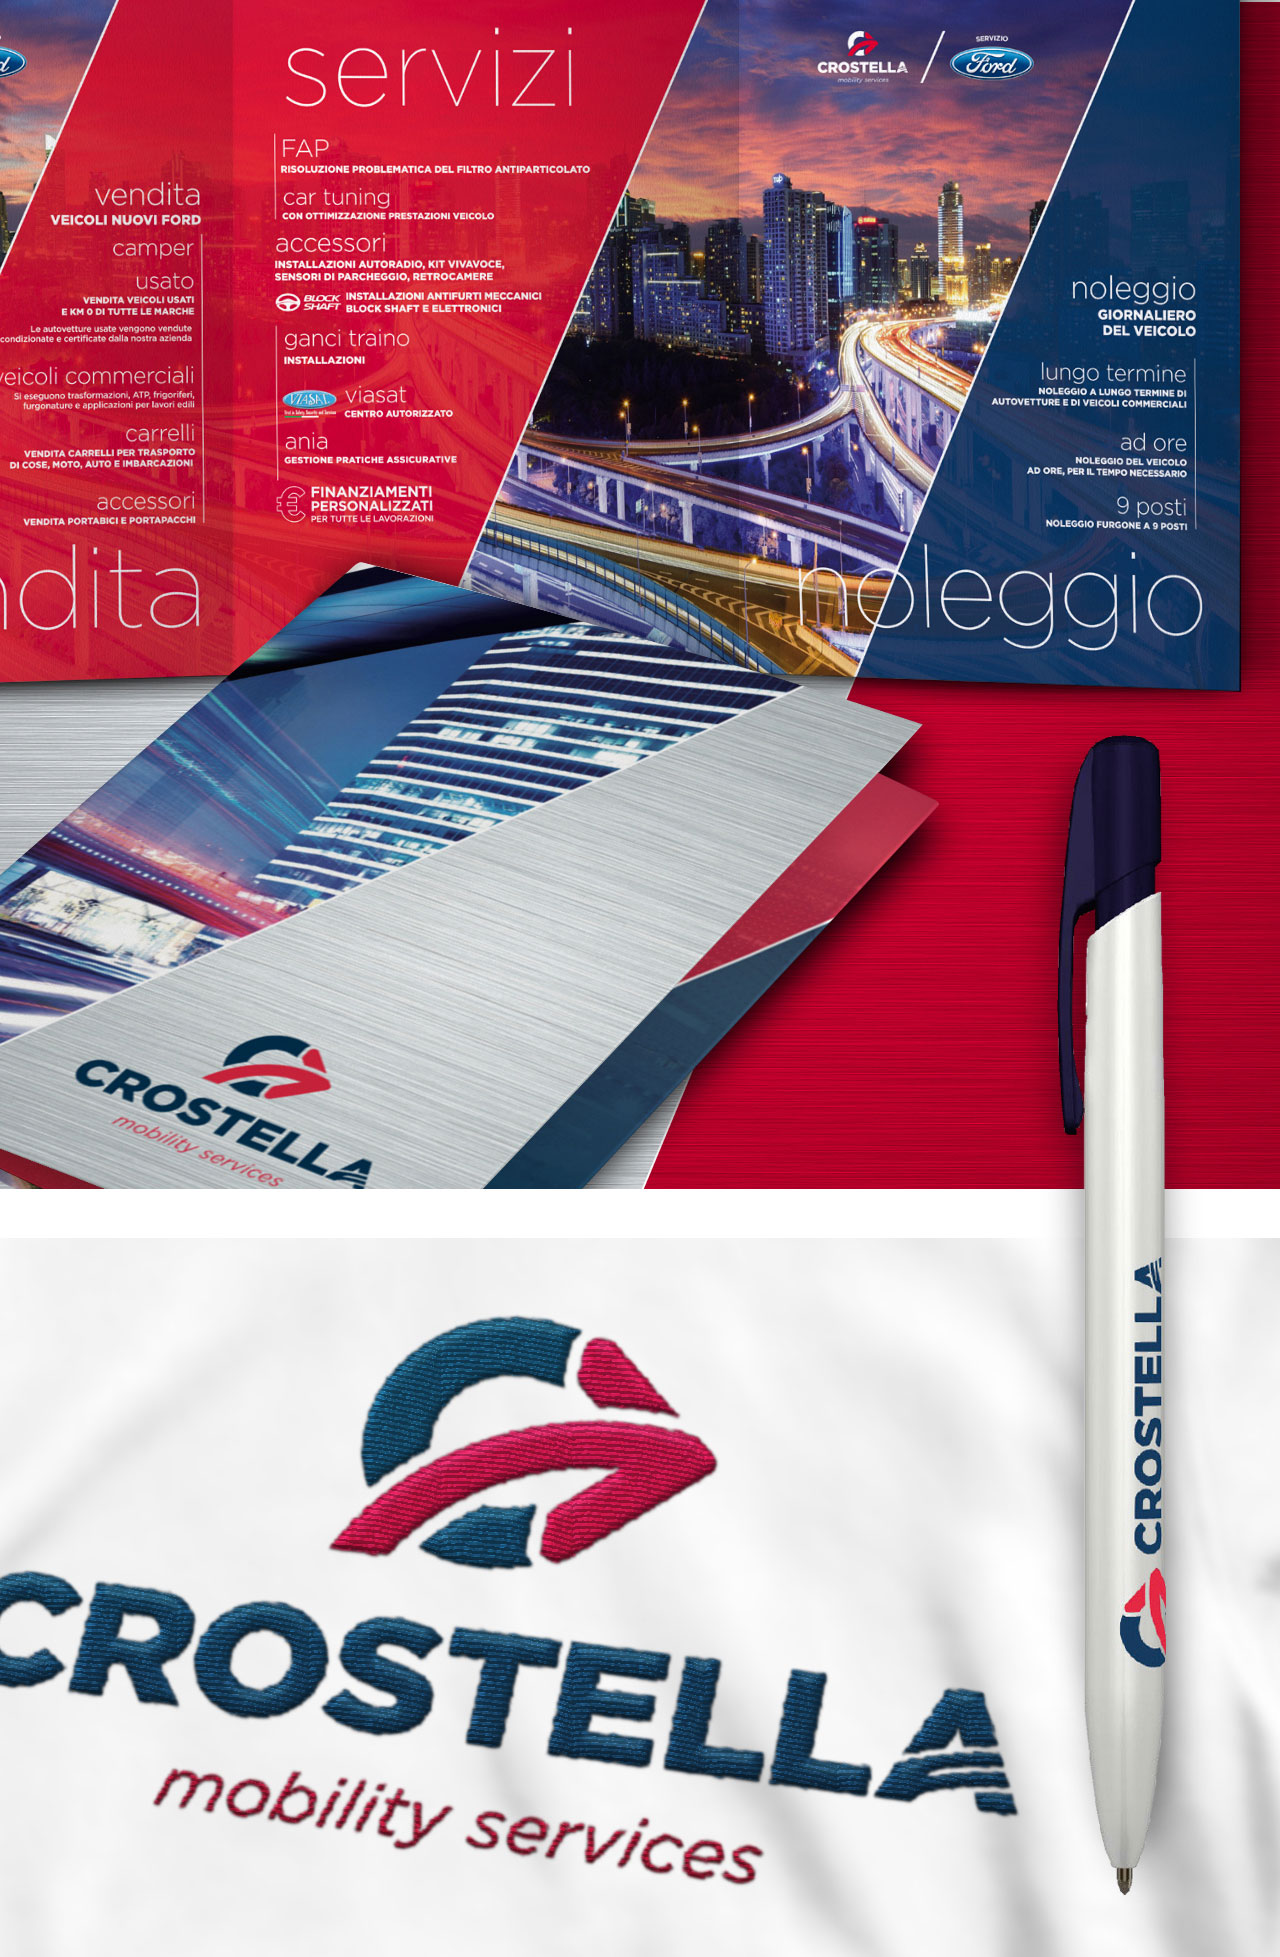 crostella mobility services riano cartellina graphid